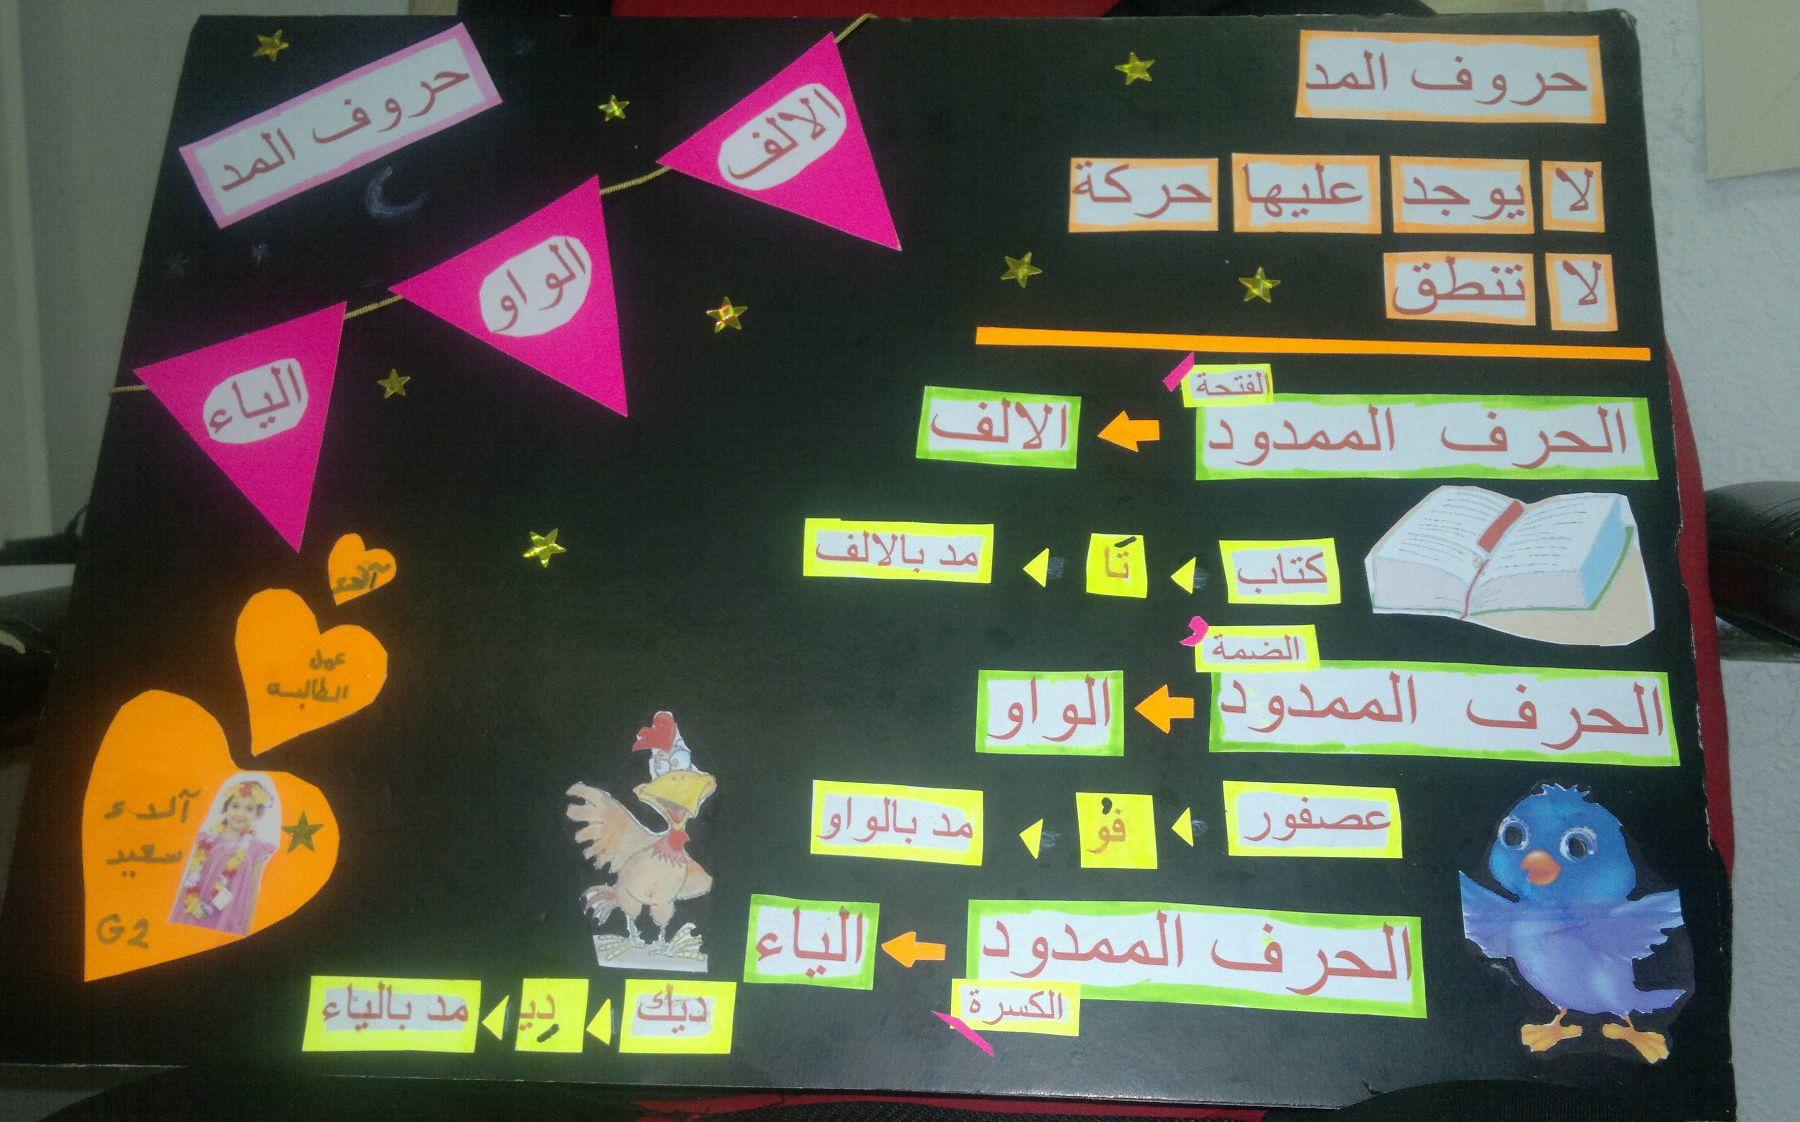 Classroom Decorations For Primary School ~ لوحة لدرس حروف المد لبنتى آلاء تعليم افضل education